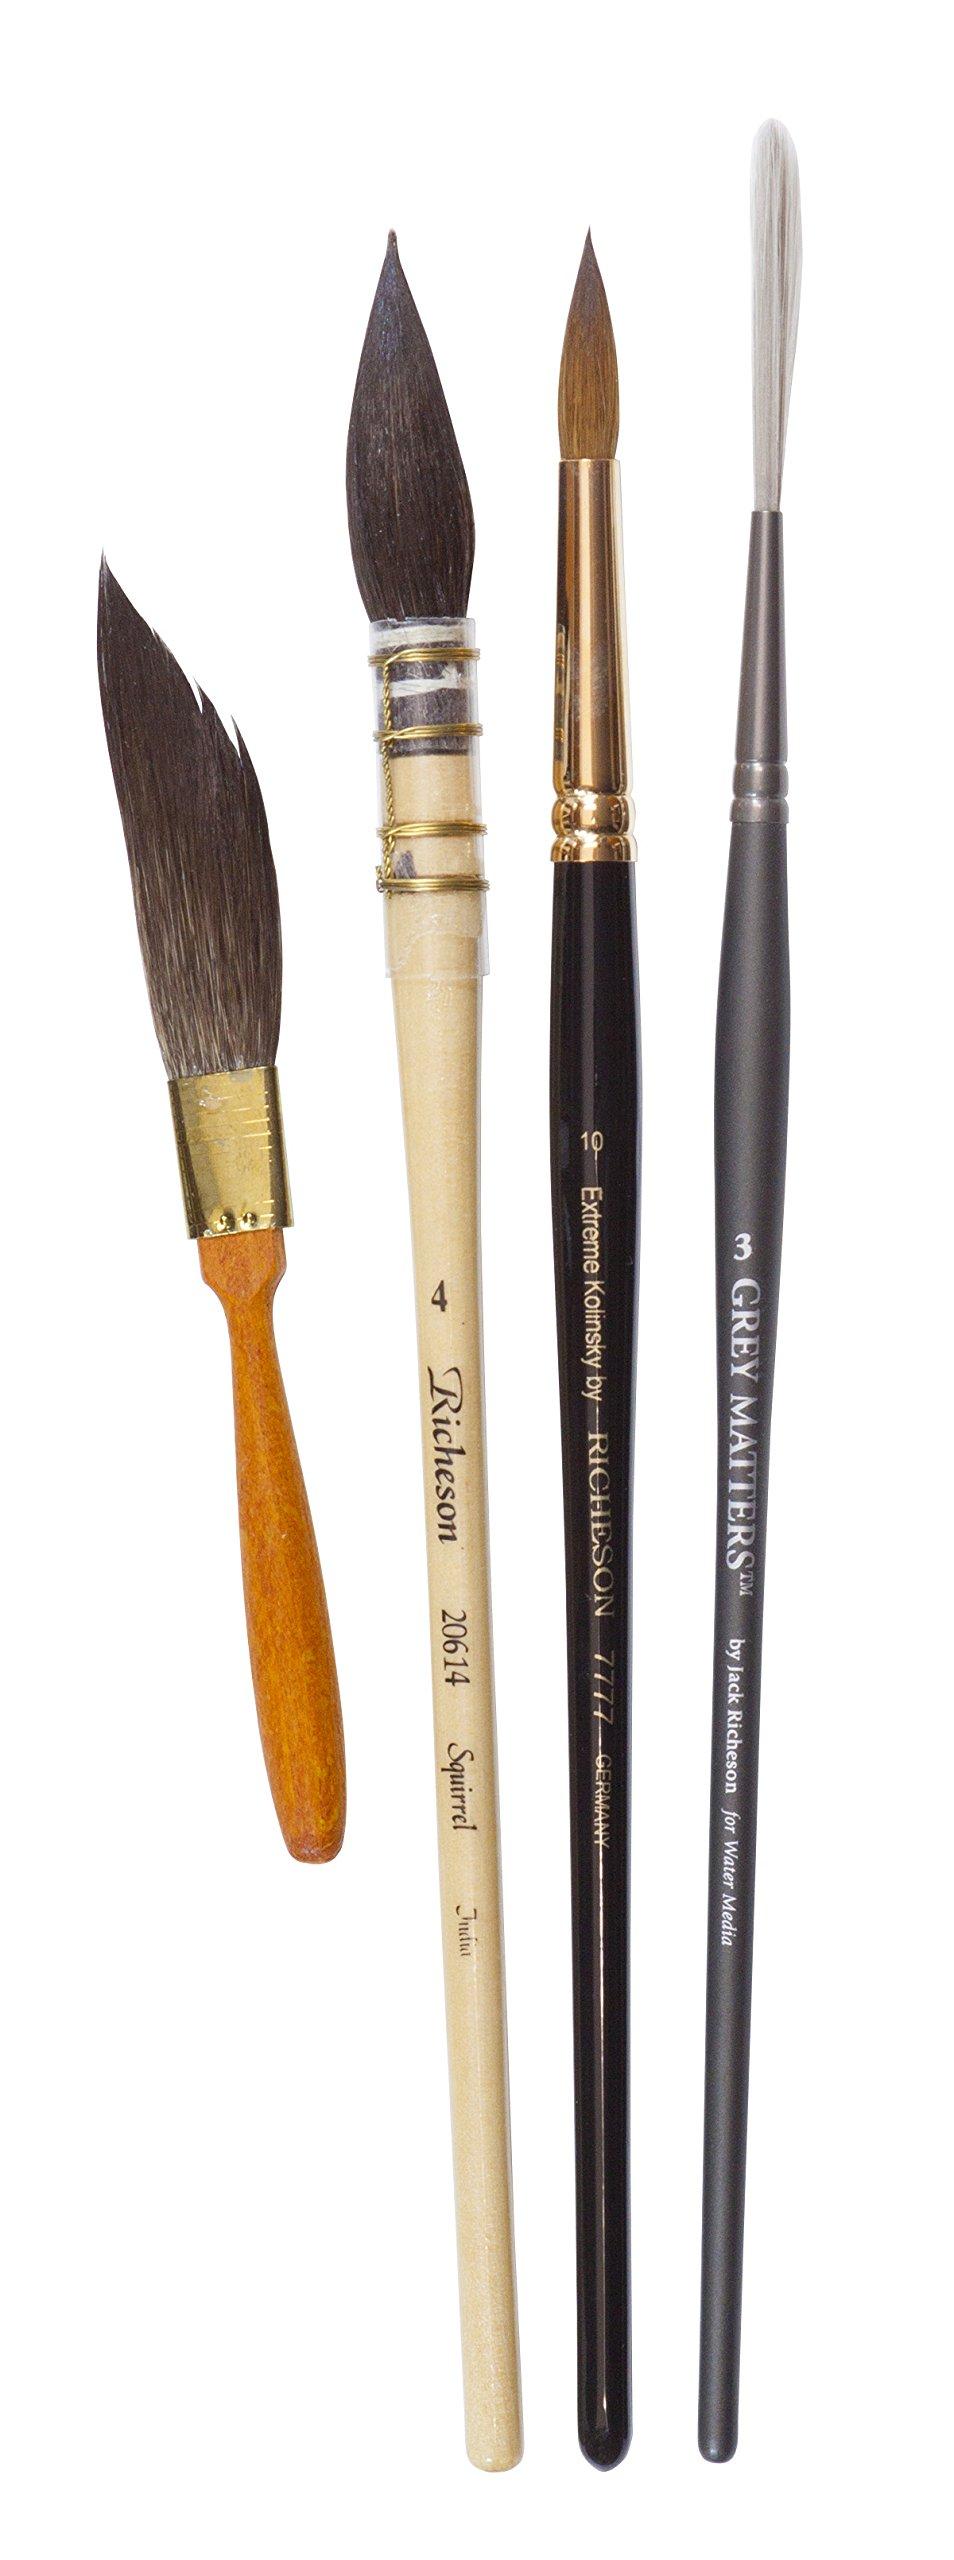 Shari Blaukopf SB002 Basic Watercolor Brush Set